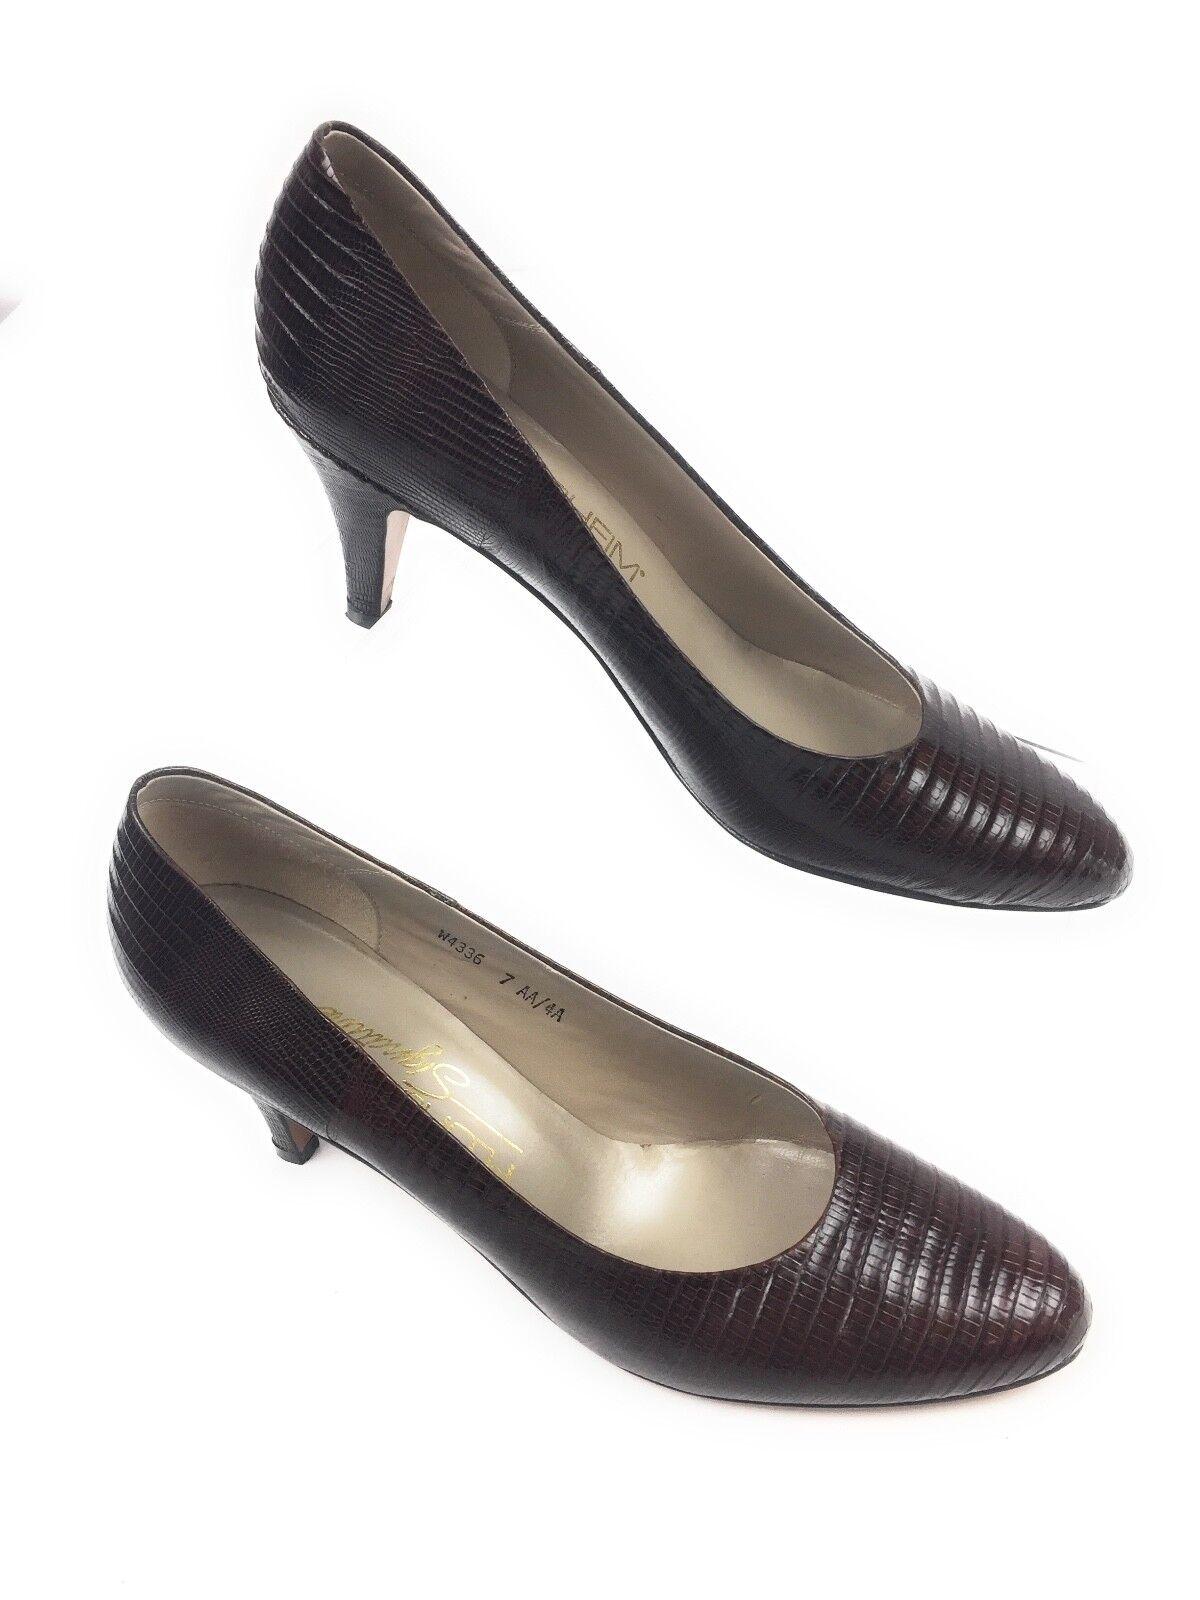 Florsheim Signature Leather Lizard Womens Reptile Embossed Pumps Heels Shoes Womens Lizard 7AA 5a9d4d